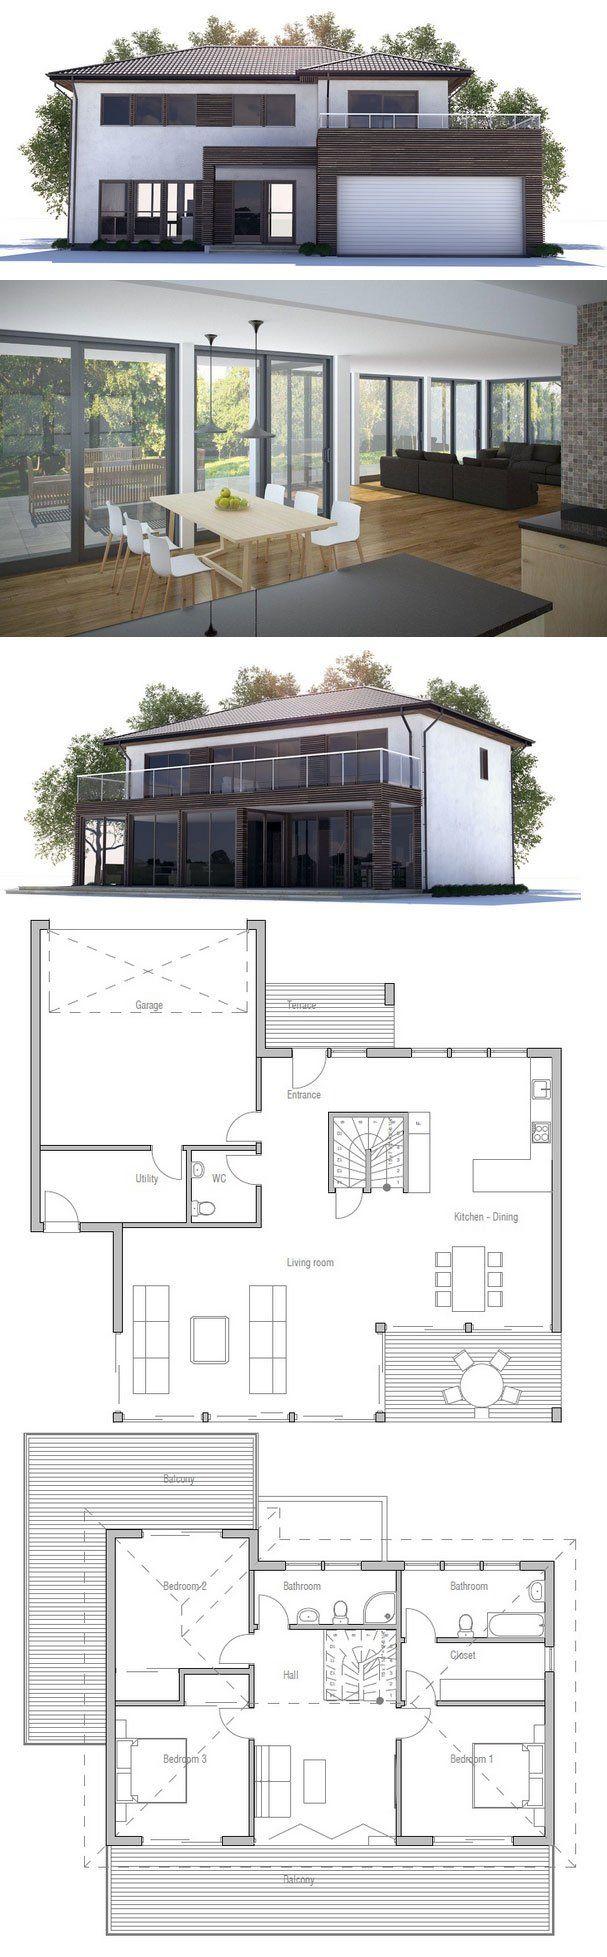 Modern Architecture House Floor Plans plan 80789pm: split level contemporary house plan | contemporary